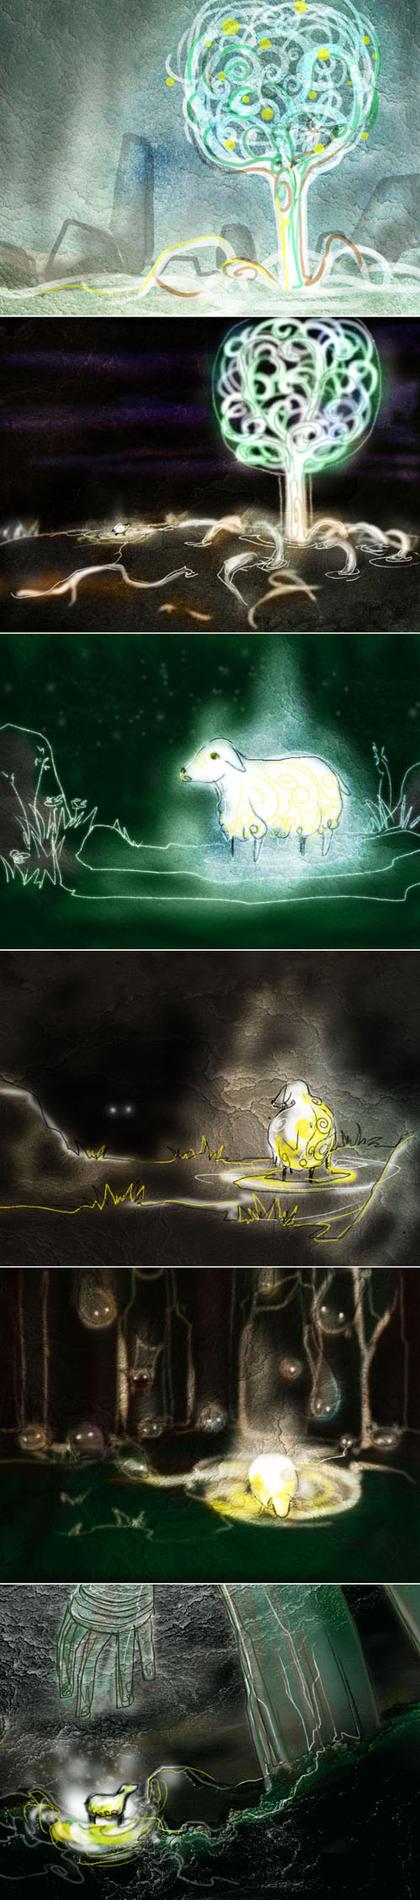 .sheepbulb story beat tests by llyse